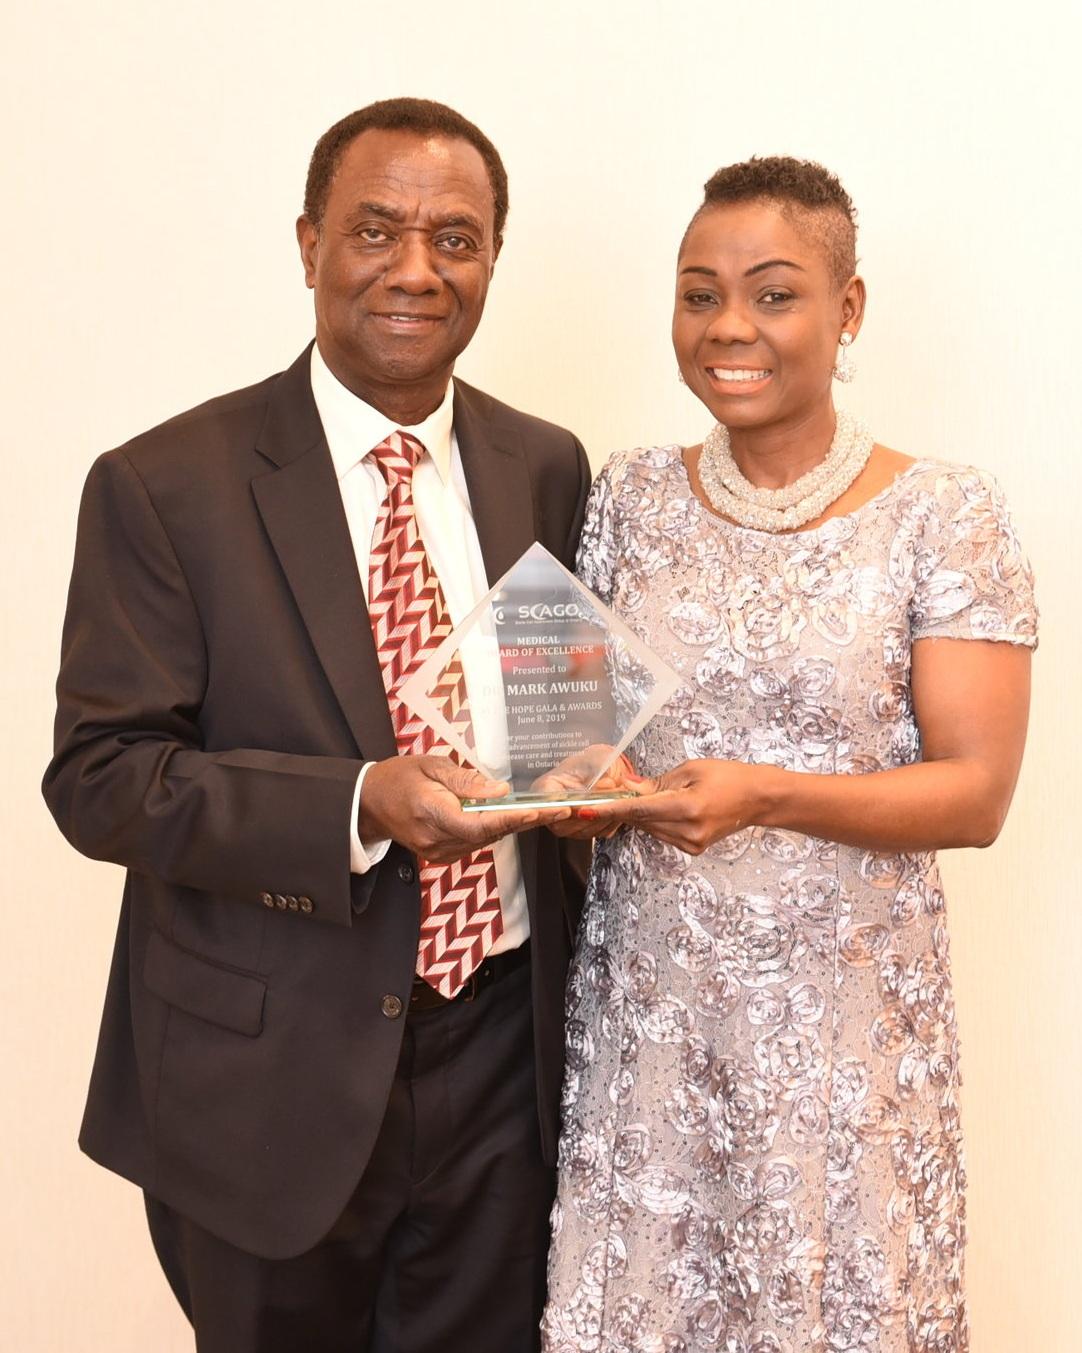 SCAGO founder Lanre Tunji-Ajayi with Dr. Mark Awuku